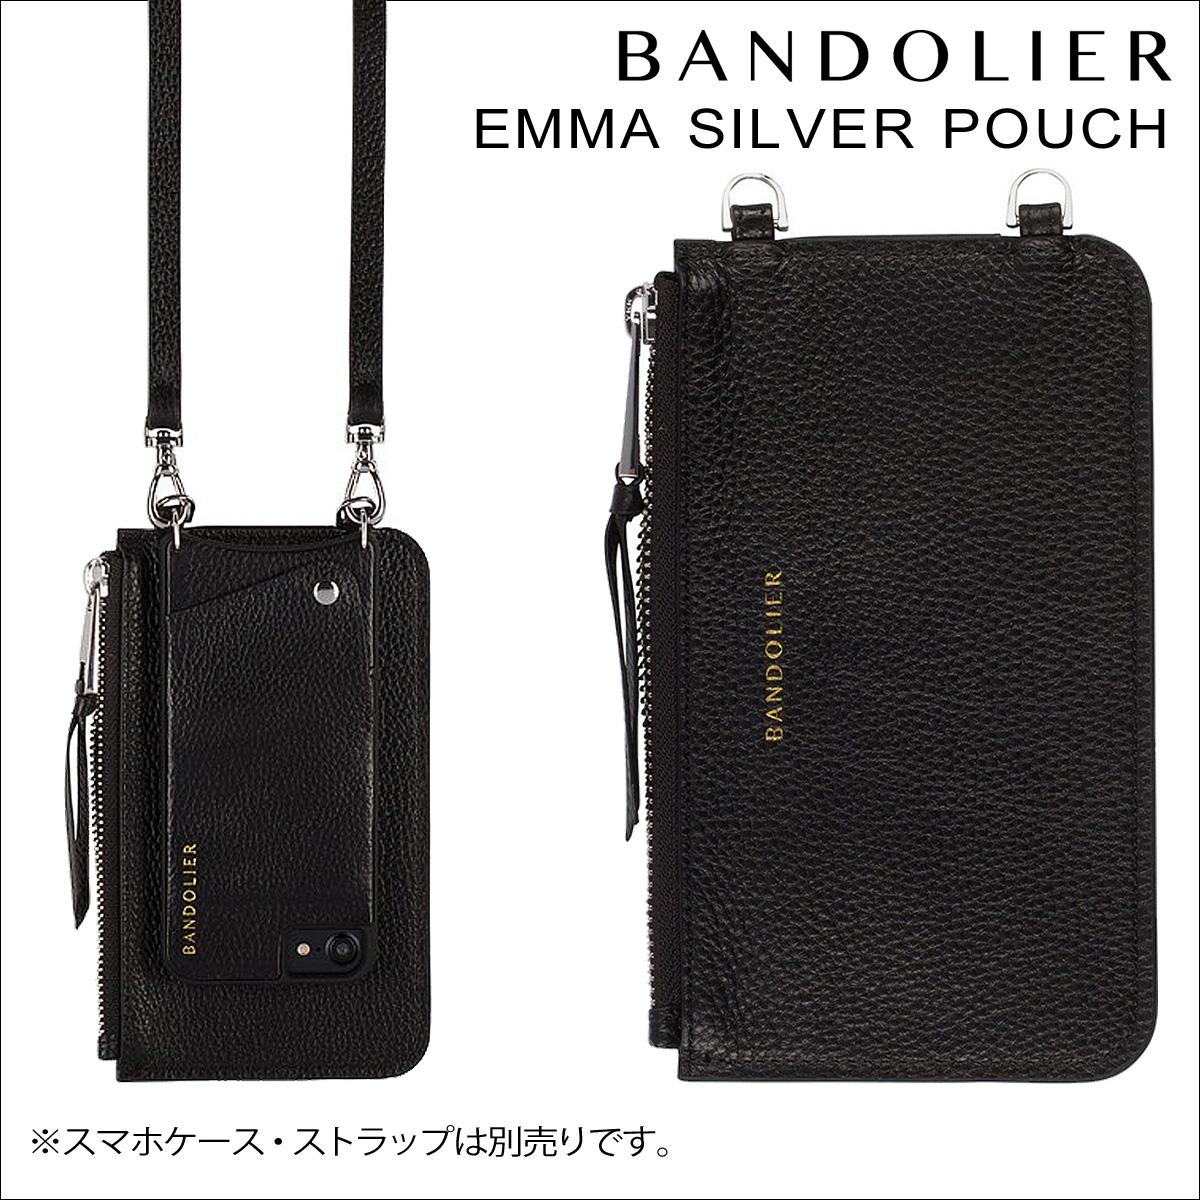 BANDOLIER バンドリヤー ポーチ EMMA POUCH レザー メンズ レディース